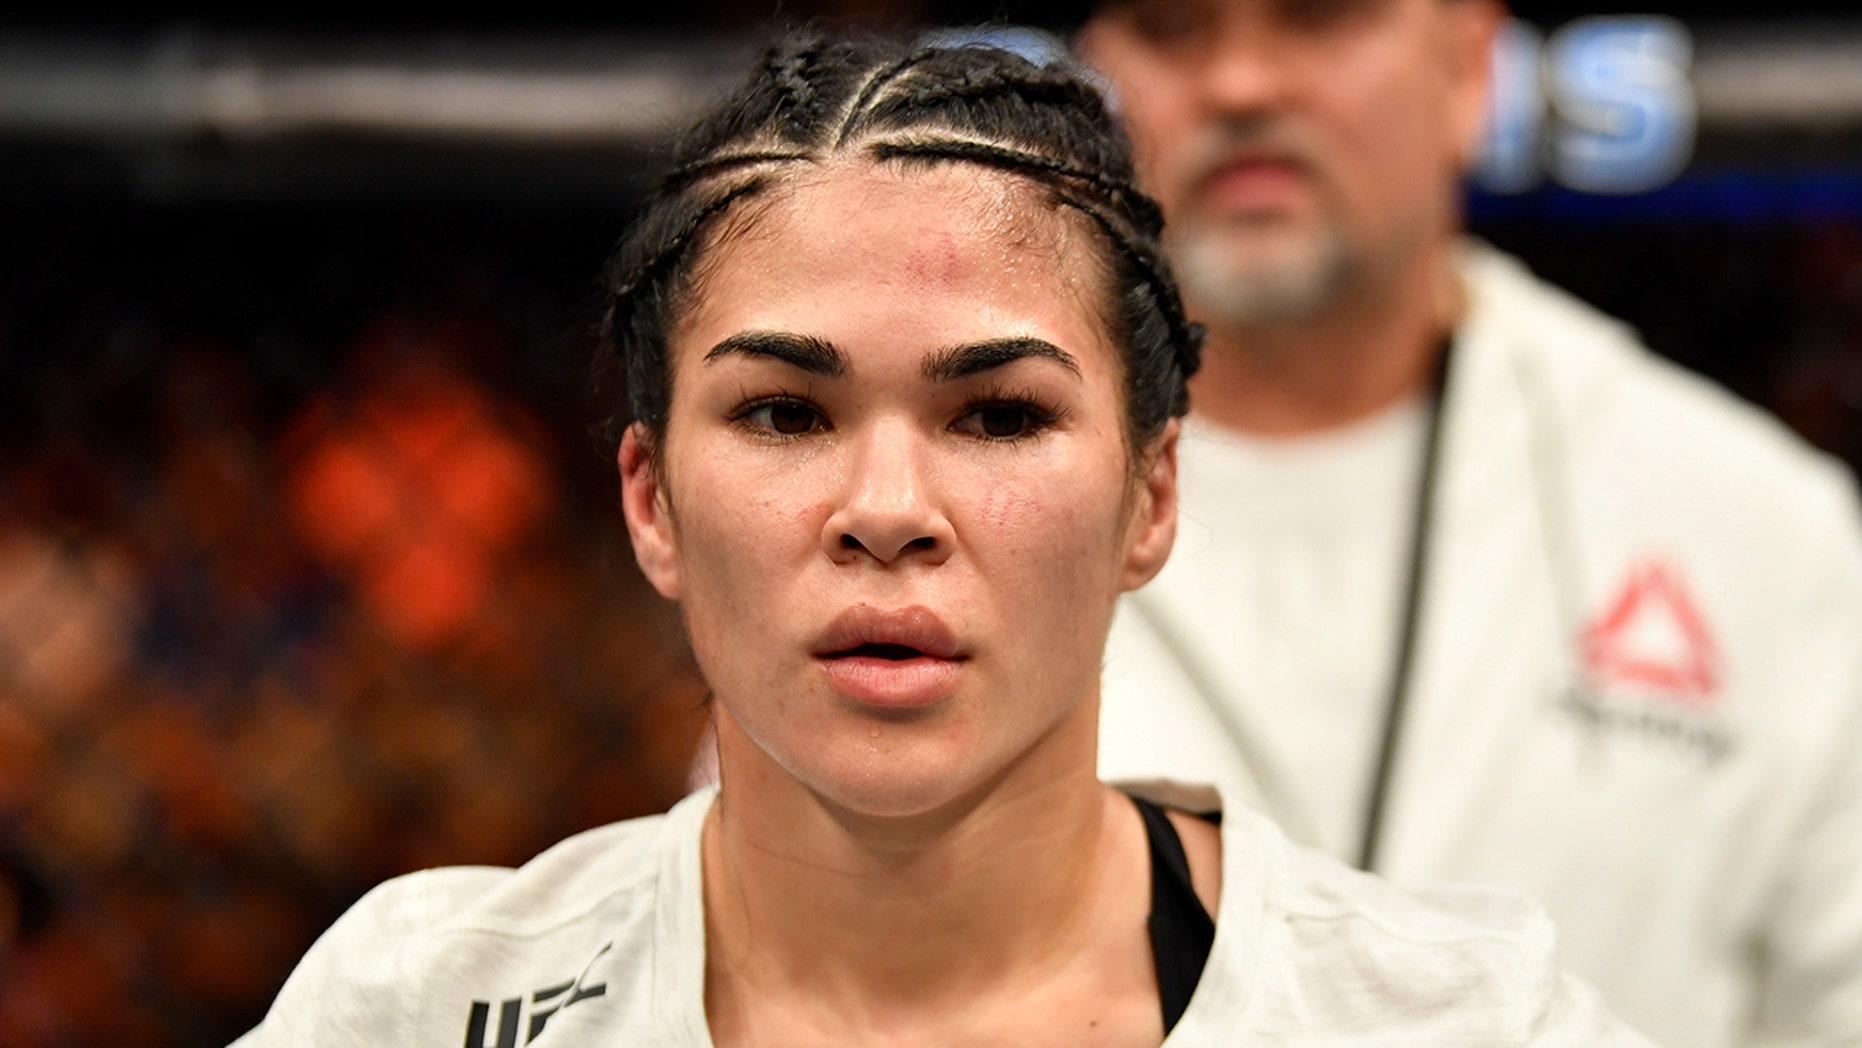 Rachael Ostovich will miss her upcoming fight after having her orbital bone broken.